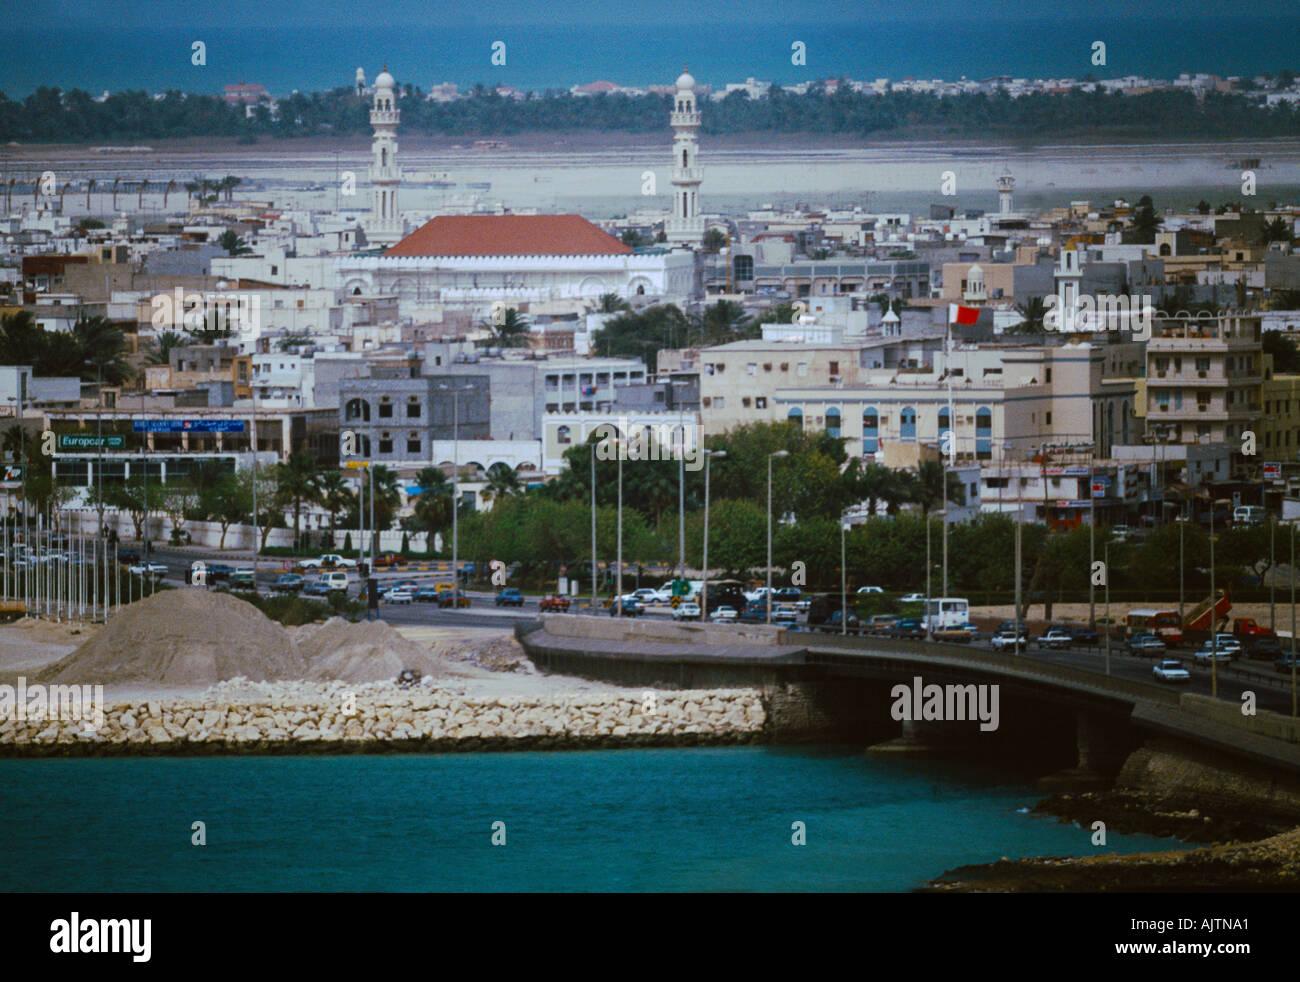 Bahrain Muharraq Island Stock Photo: 4834720 - Alamy